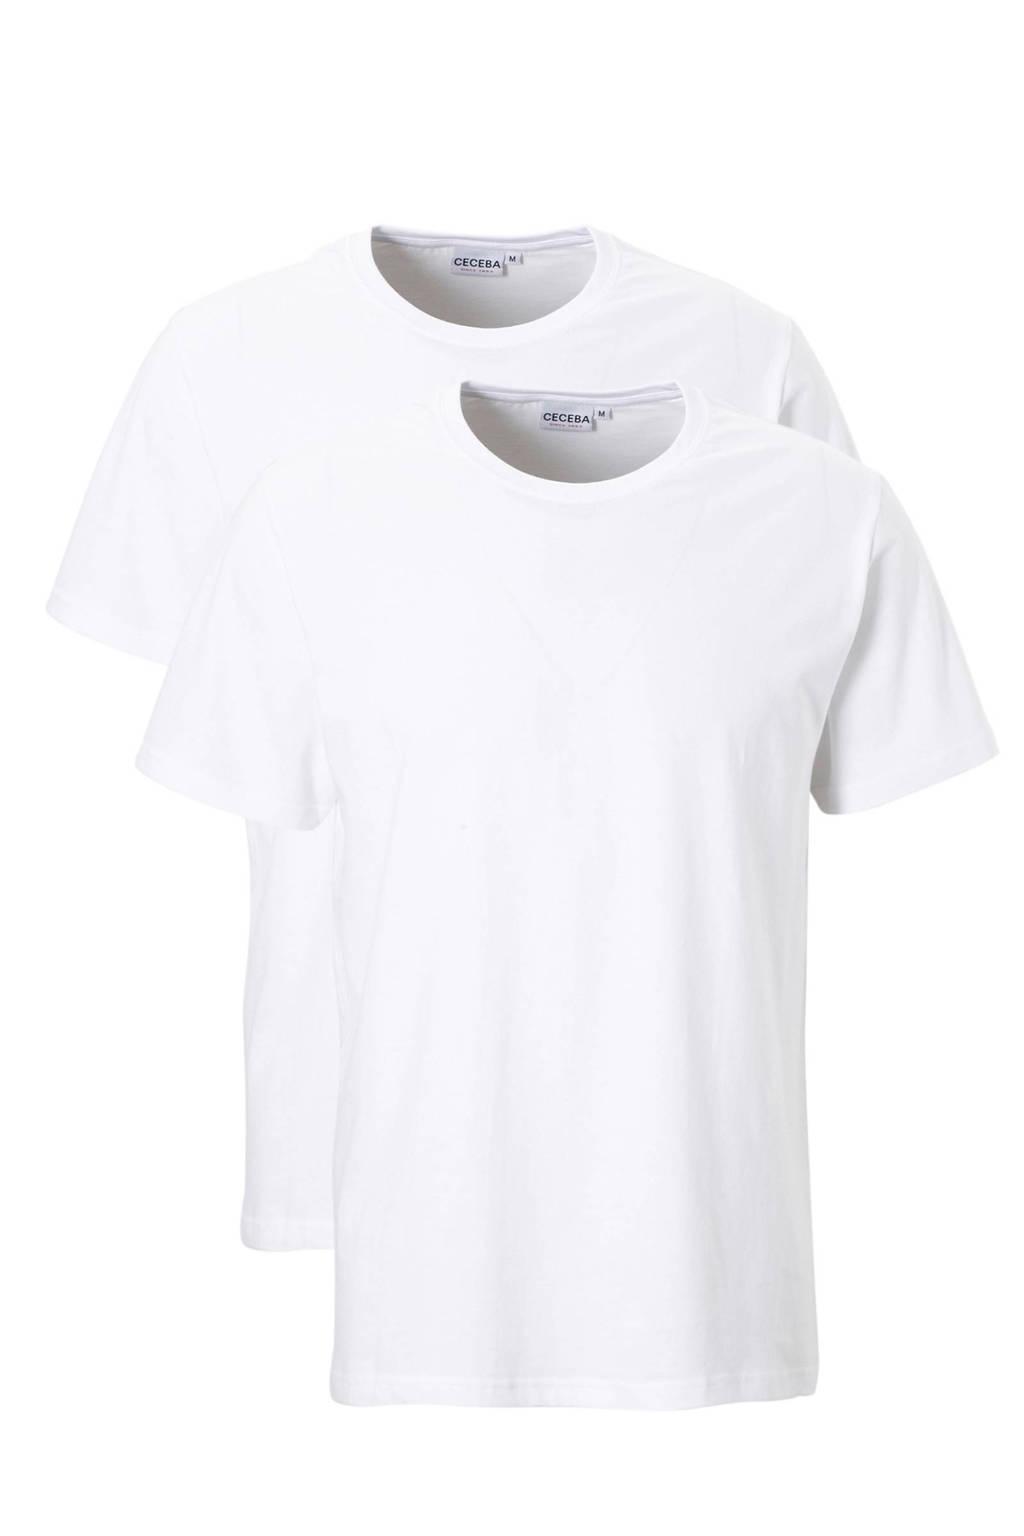 Ceceba +size basic t-shirt (set van 2) wit, Wit